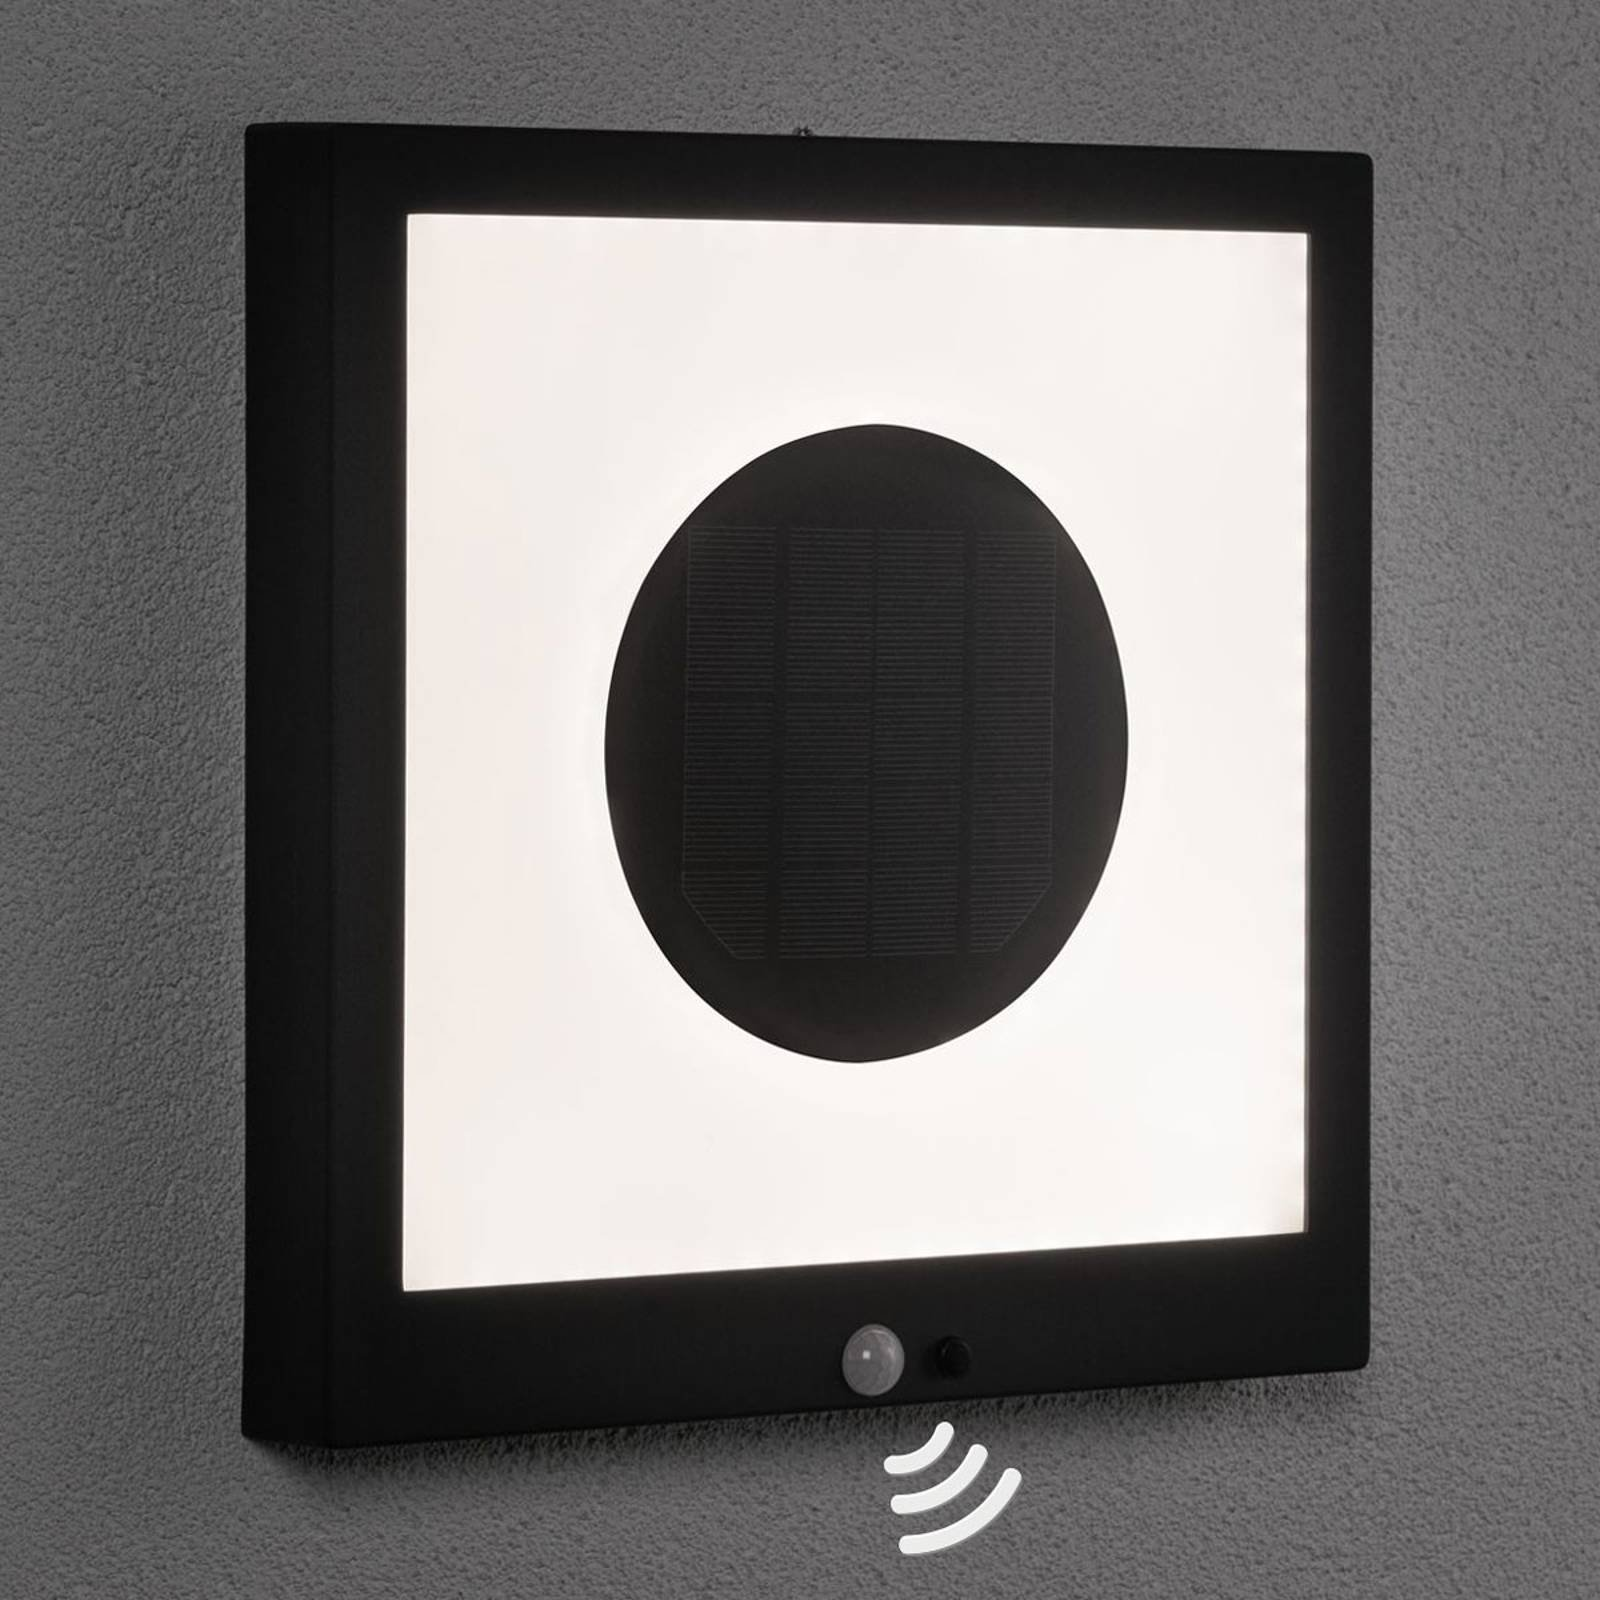 Paulmann LED-solcellepanel Taija sensor 30 x 30 cm